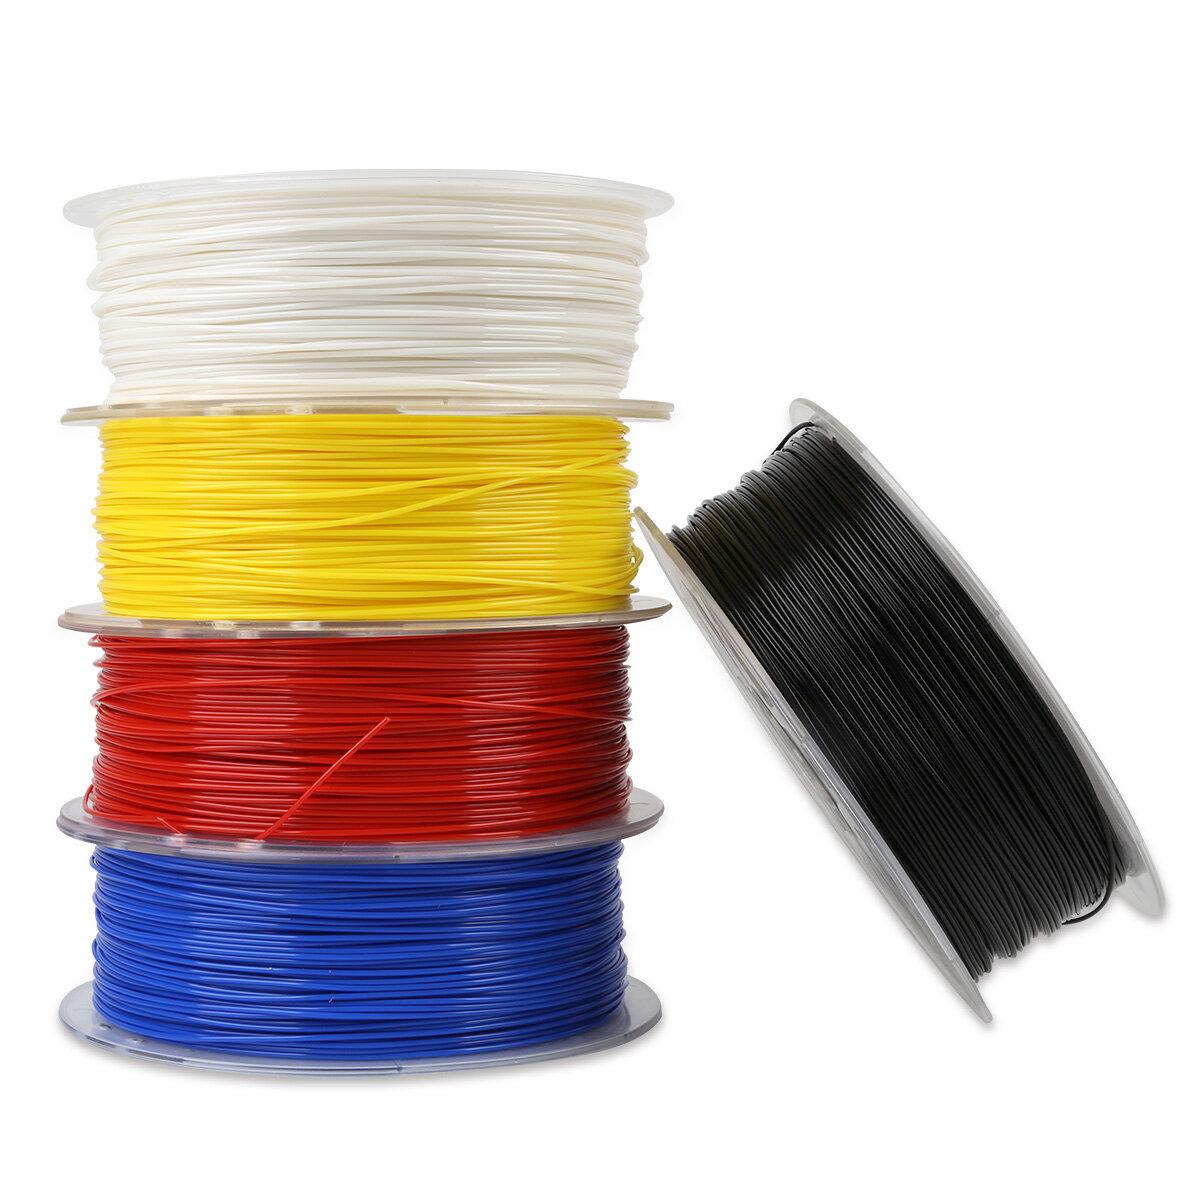 Filament Creality 3D 1KG 1.75mm PLA z EU za $23.99 / ~102zł